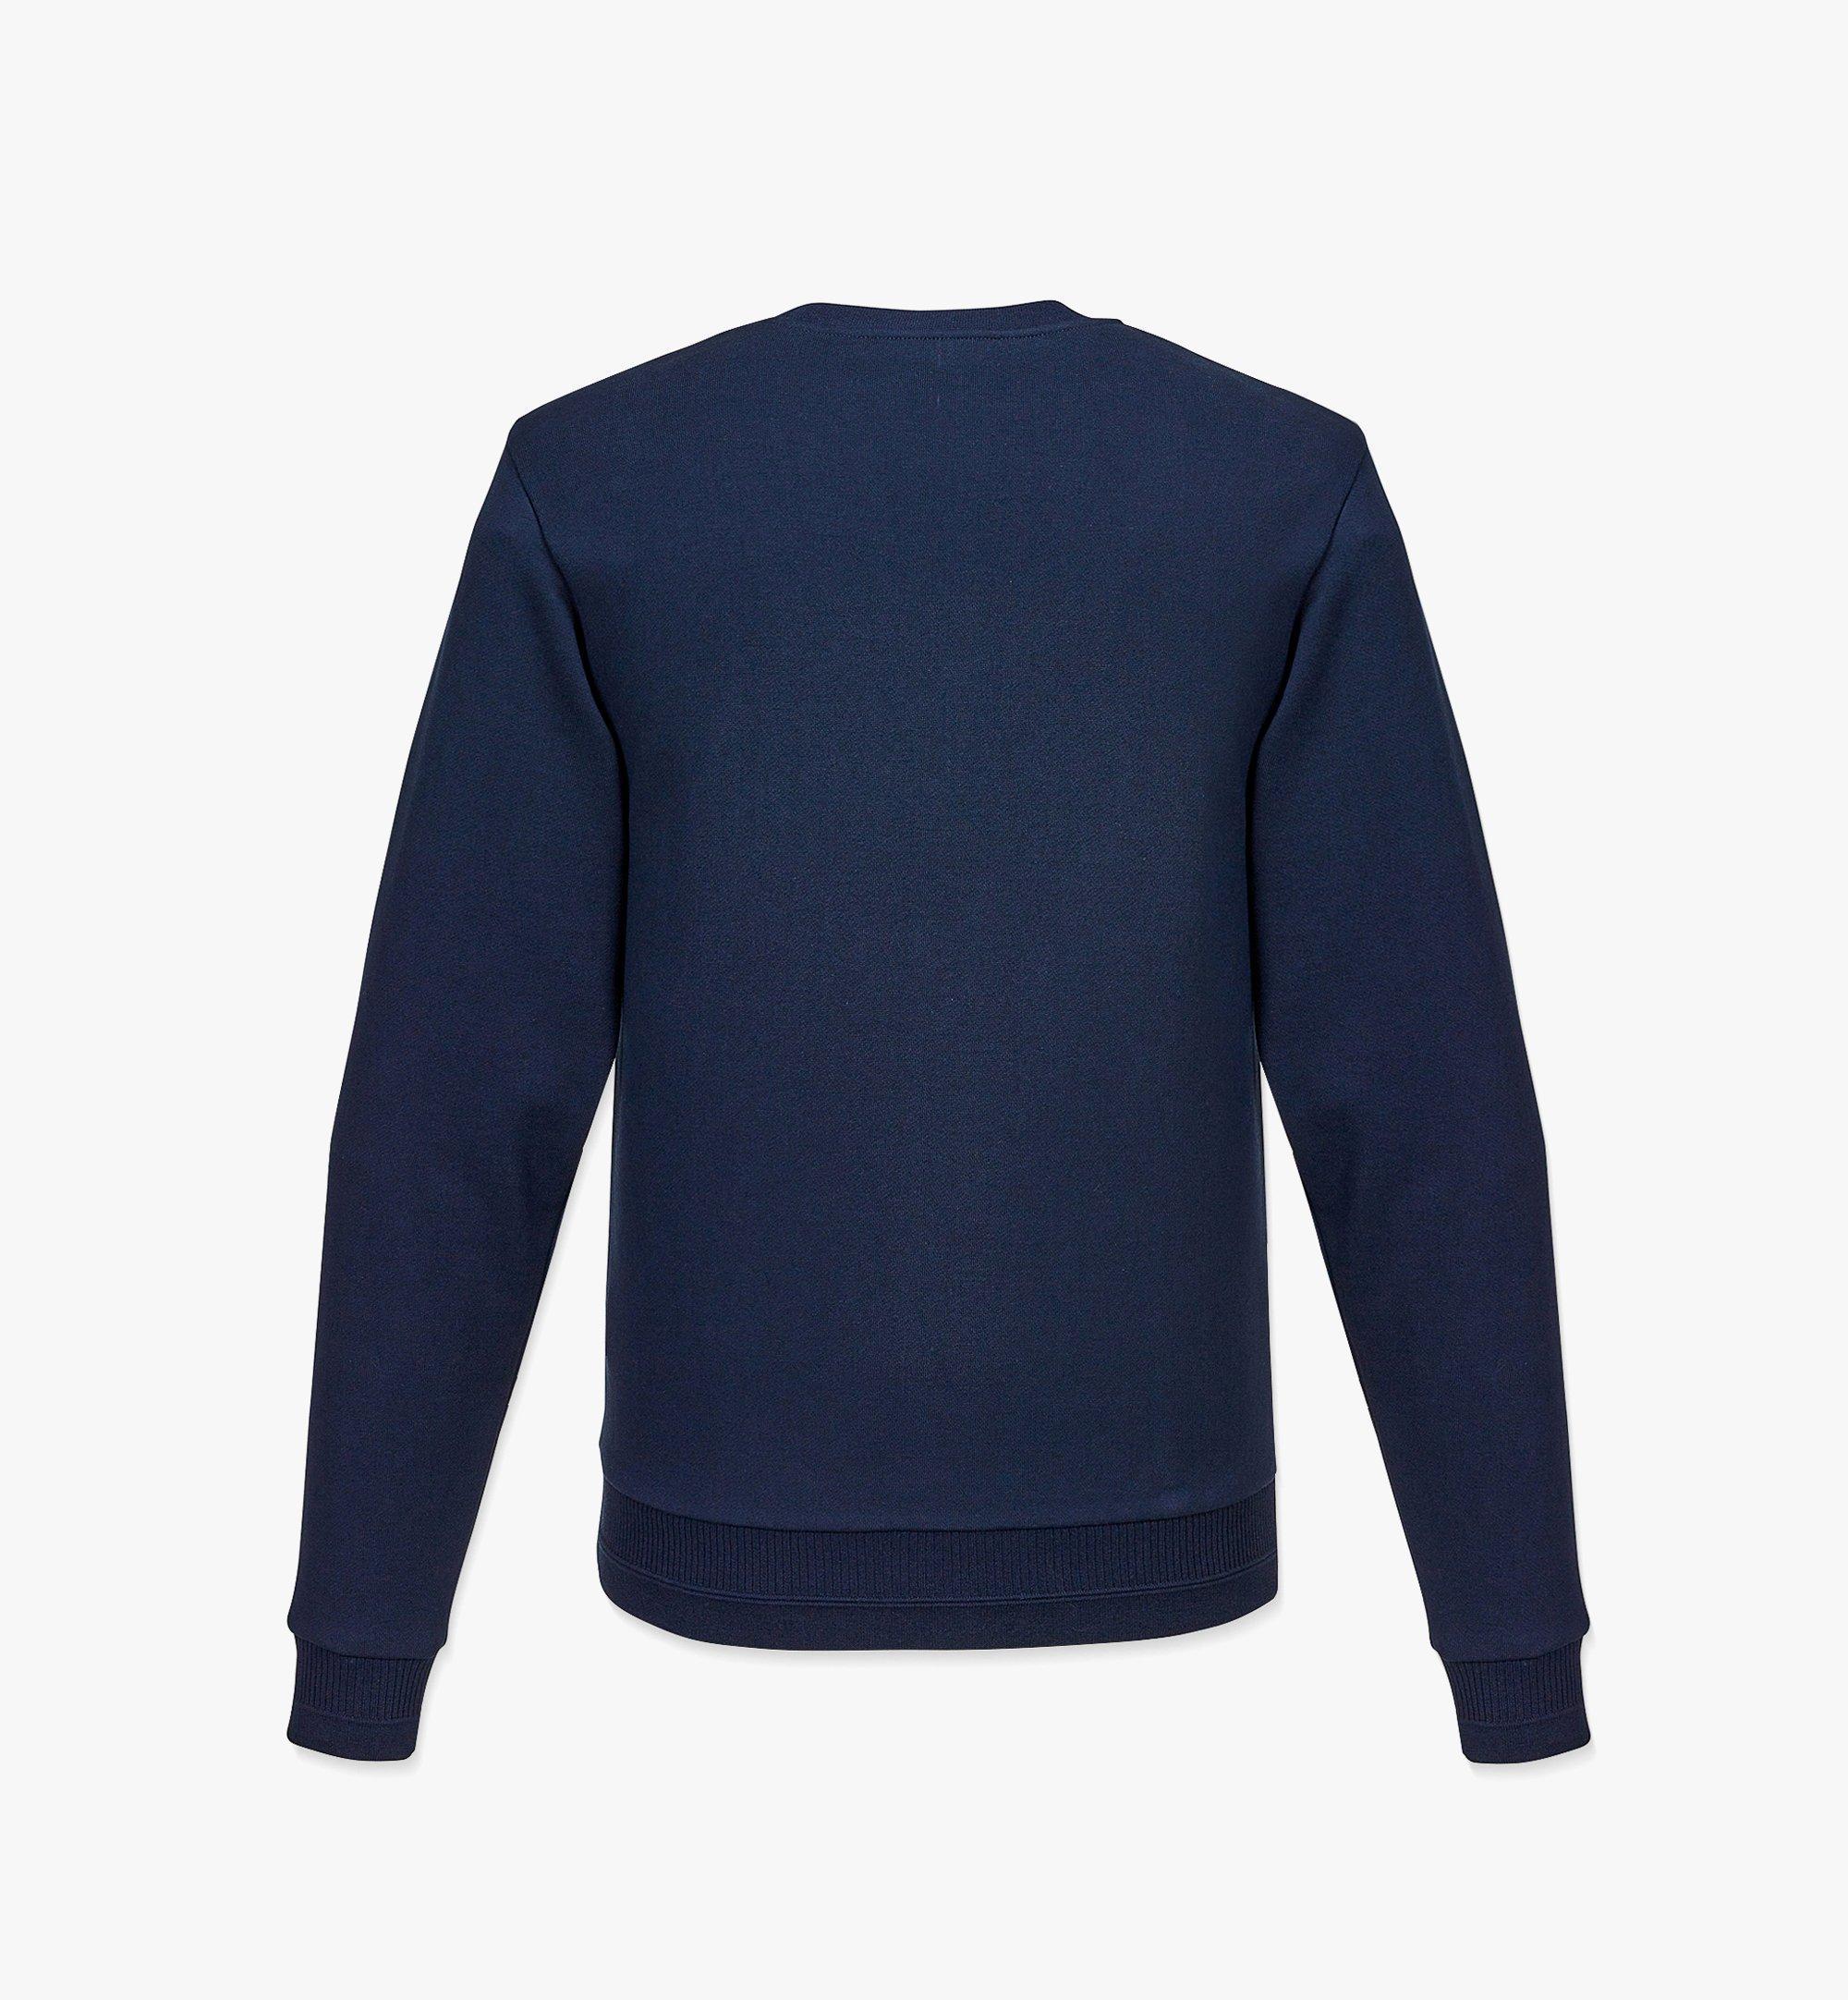 MCM 男士Geo月桂叶运动衫 Blue MHABSMM04U100M 更多视角 1